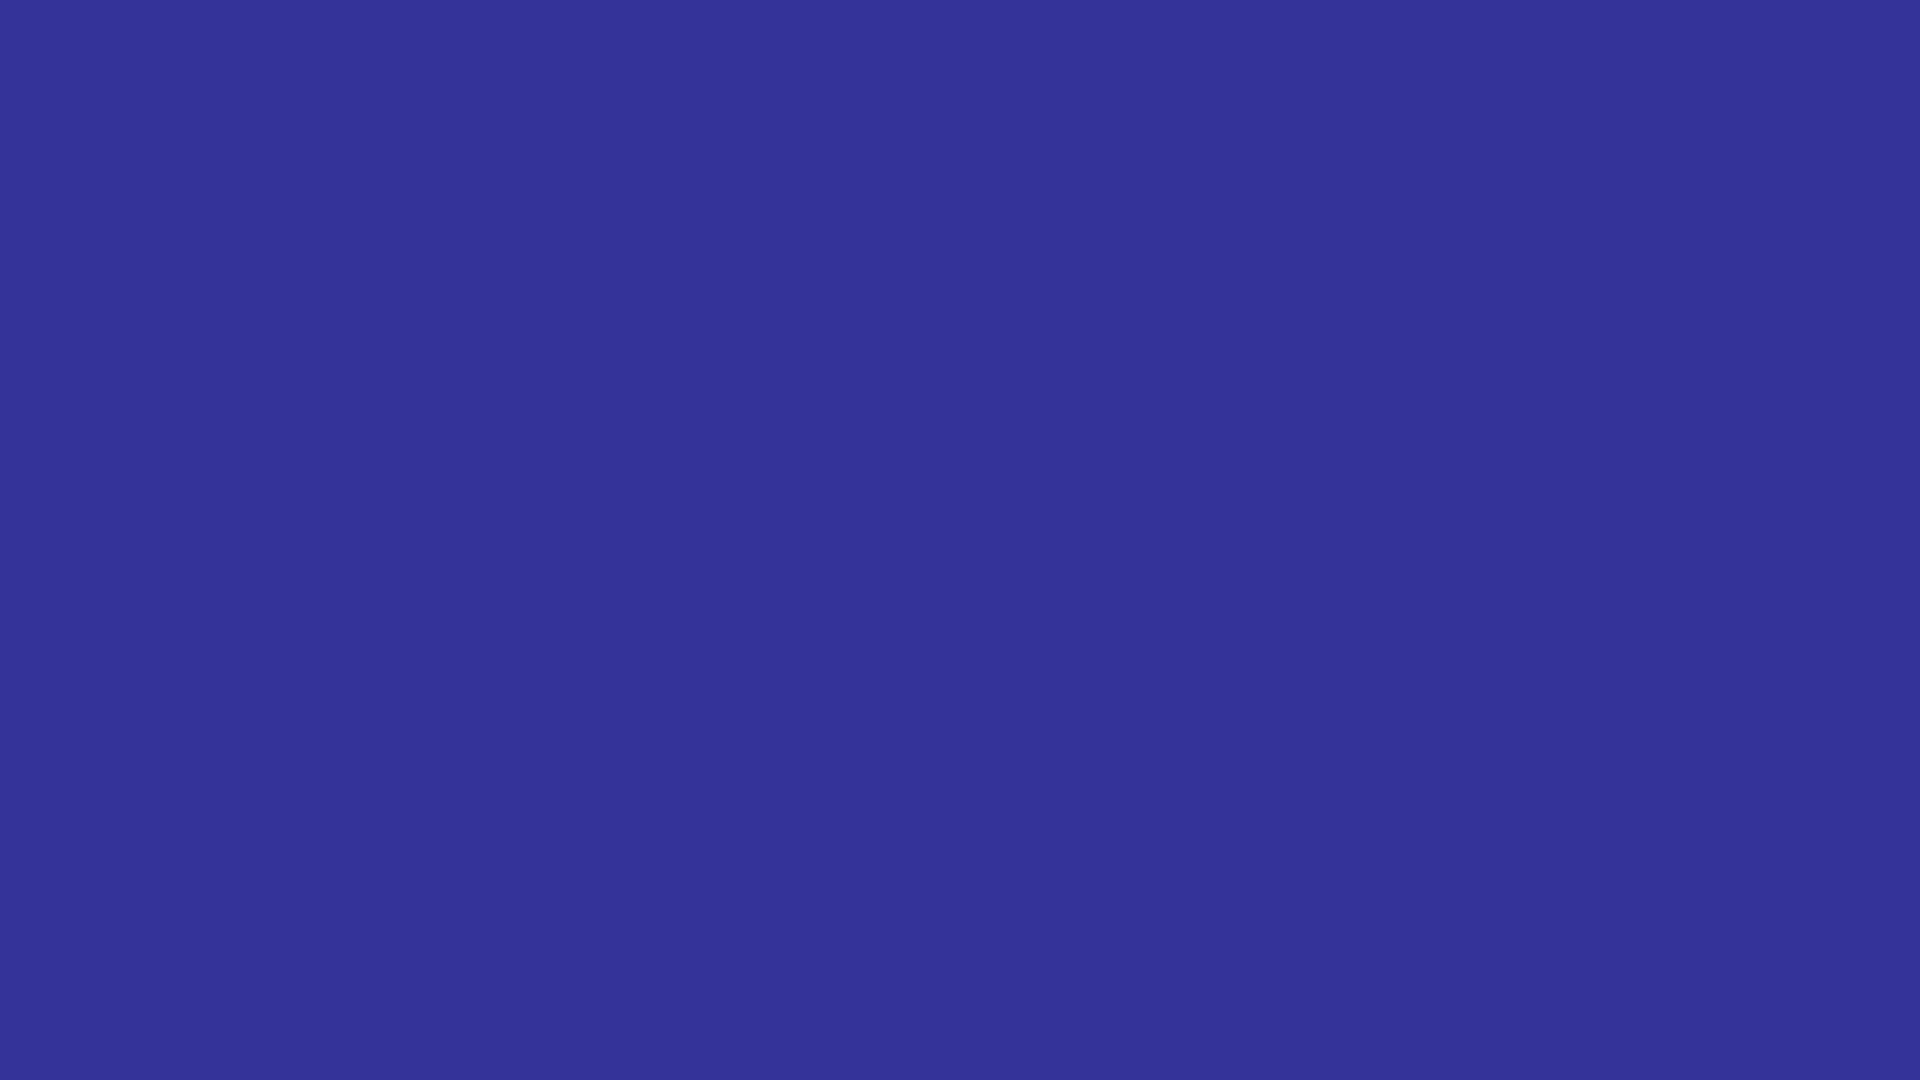 1920x1080 Blue Pigment Solid Color Background